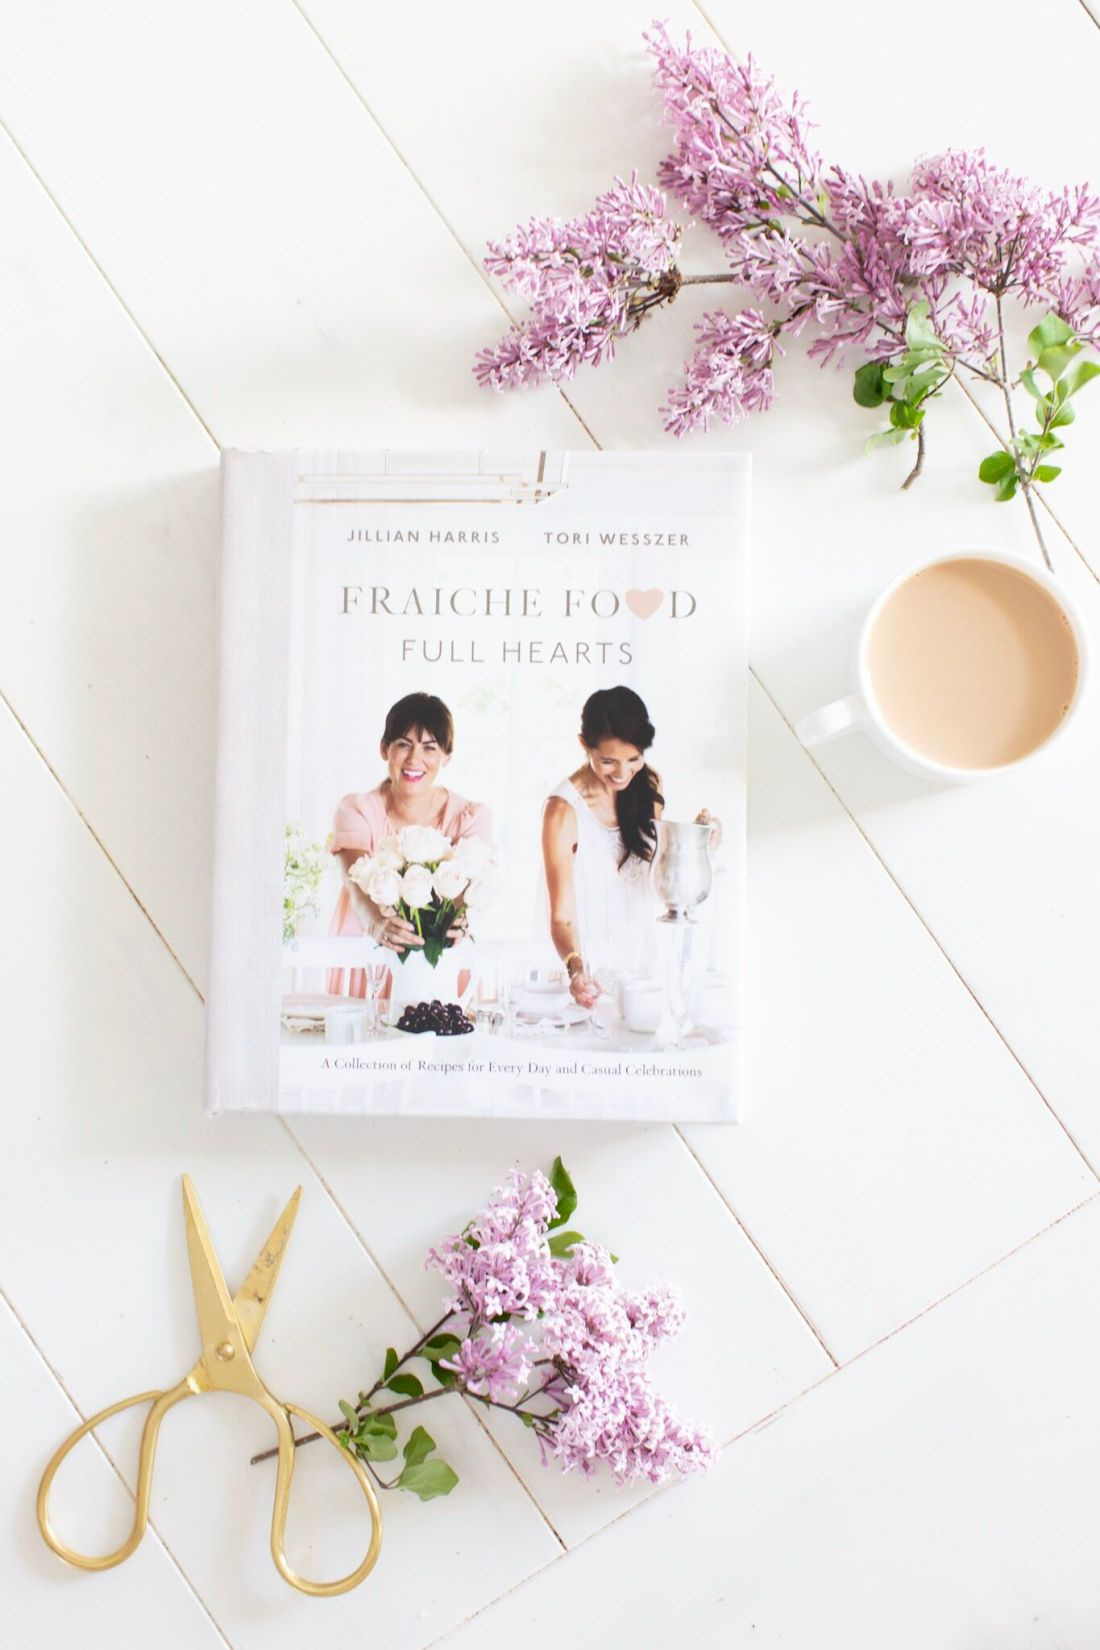 Fraiche Food, Full Hearts Cookbook by Jillian Harris and Tori Wesszer